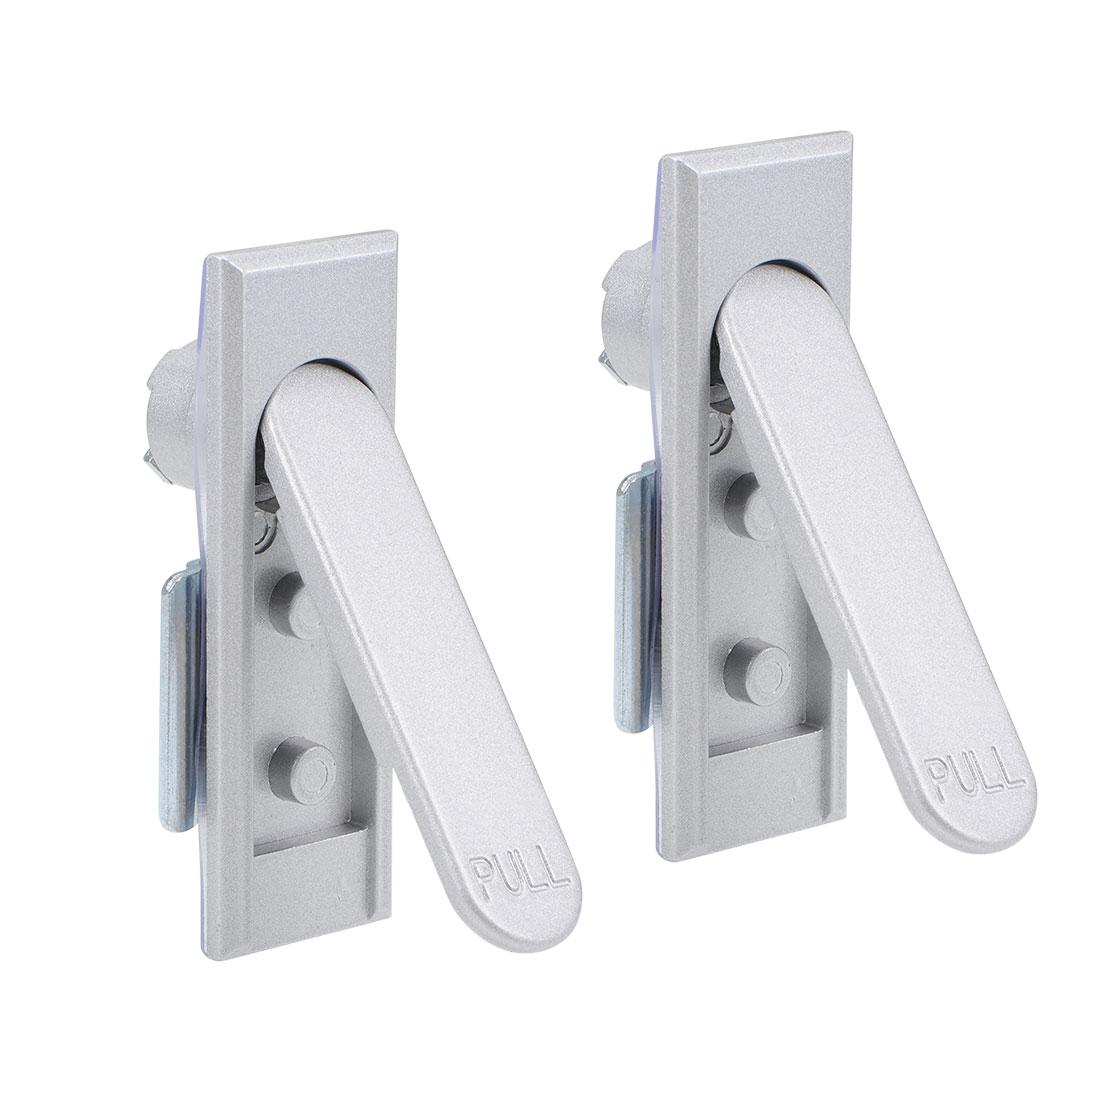 Electric Cabinet Panel Cam Lock Pull Type Door Lock Silver 2pcs